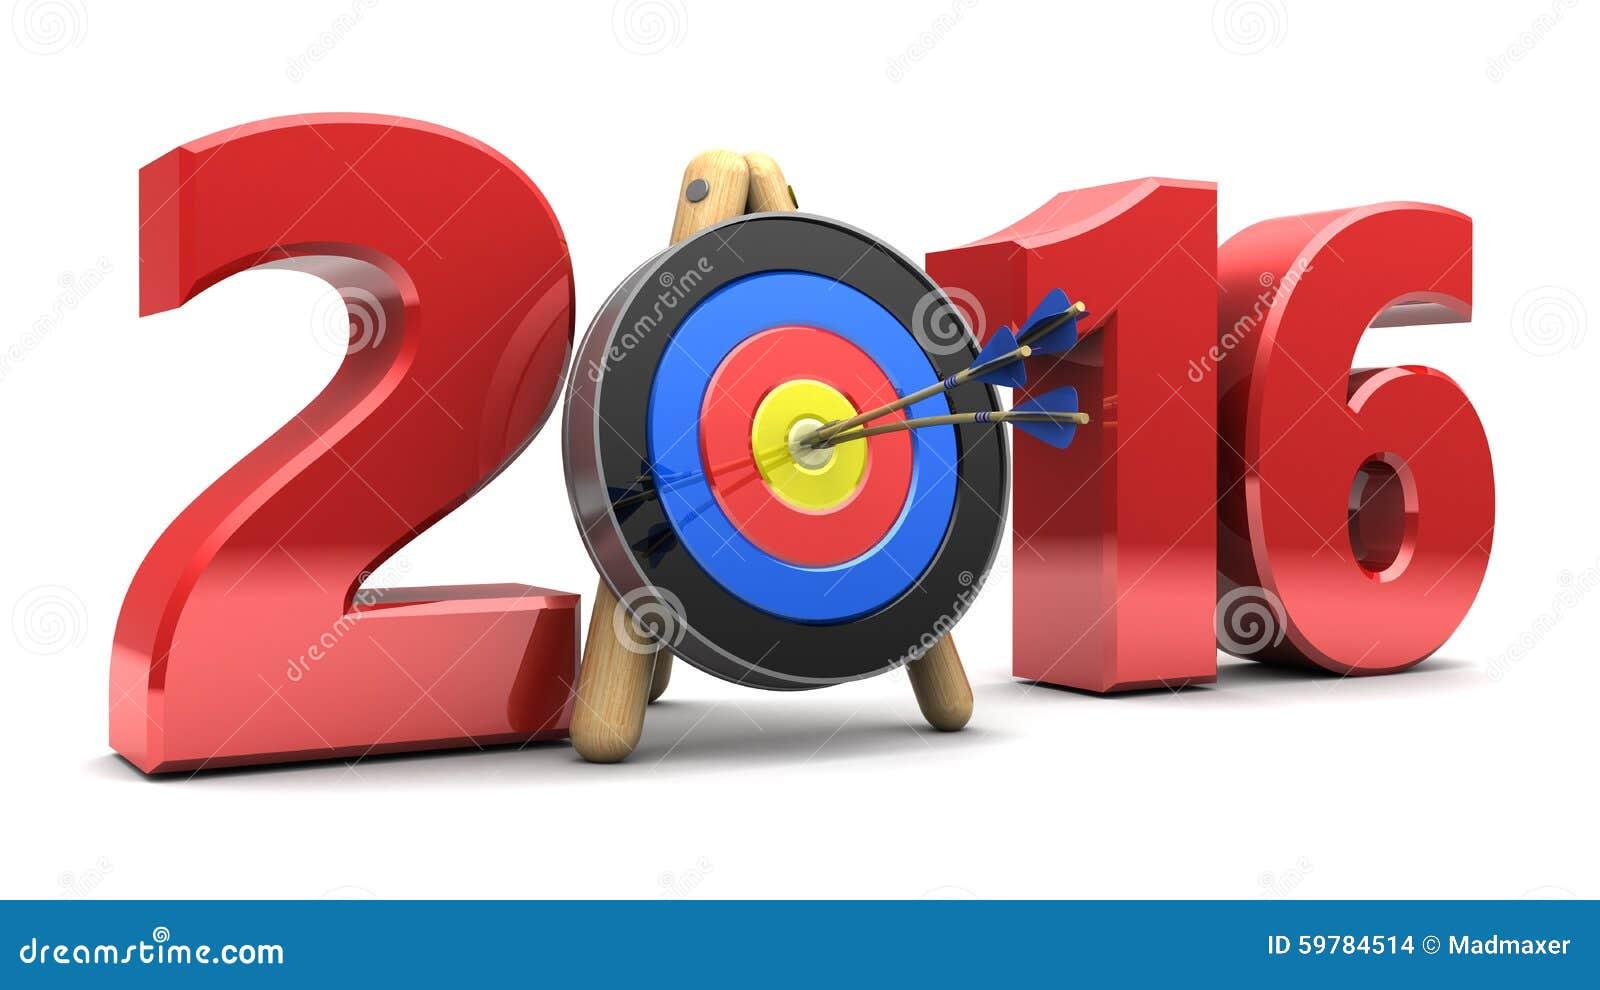 2016 Year Stock Illustration - Image: 59784514